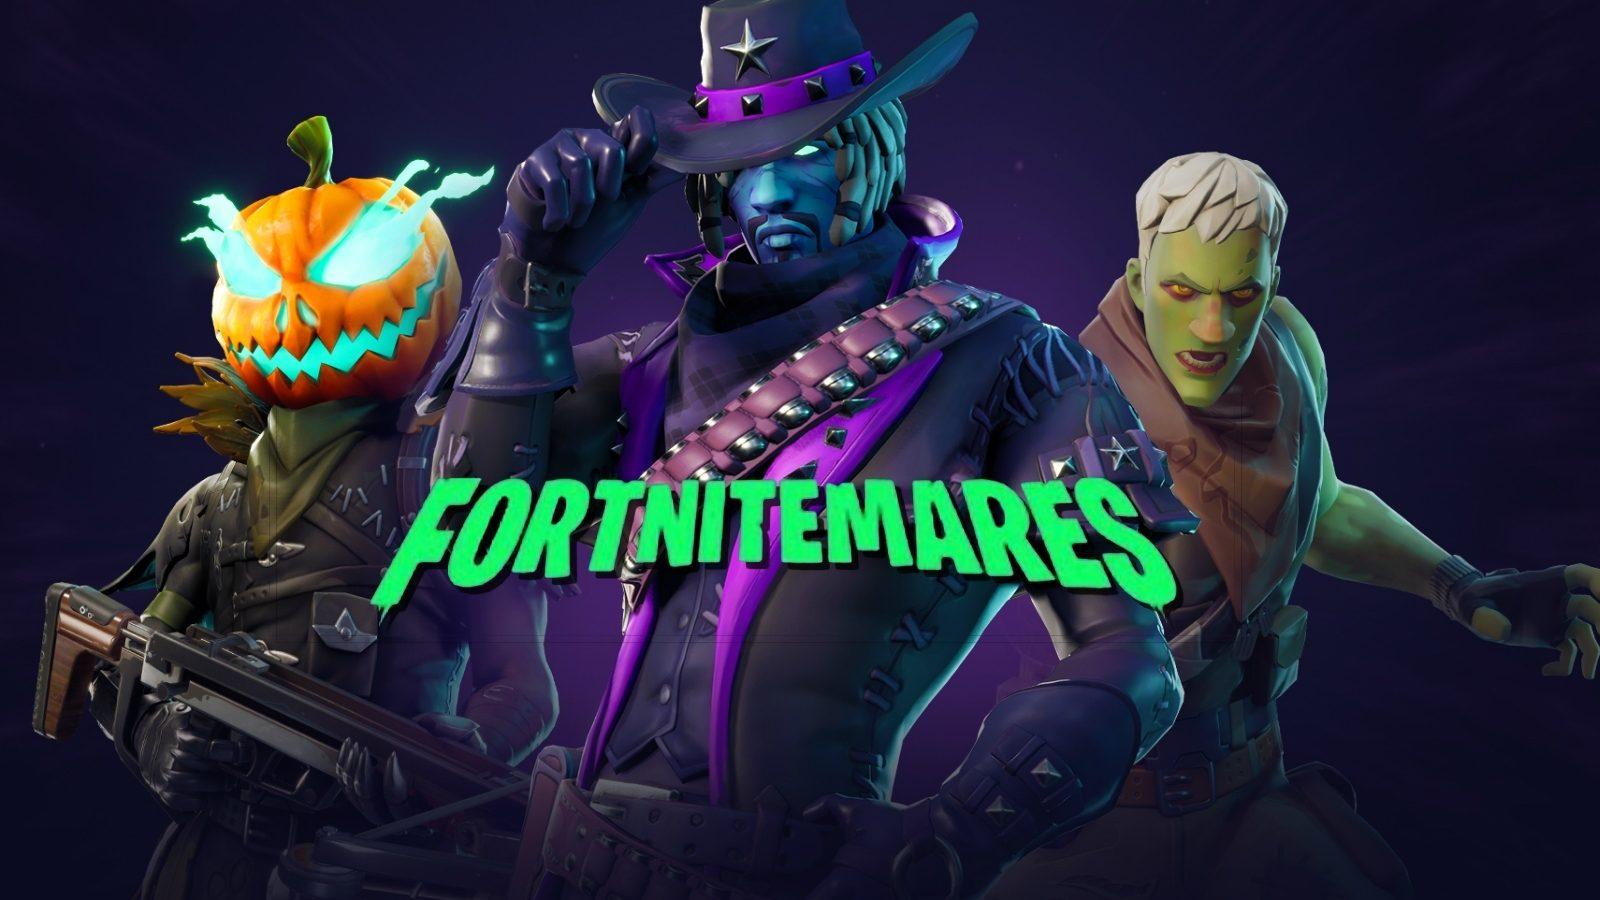 Skins de halloween evento fortnitemares de Fortnite